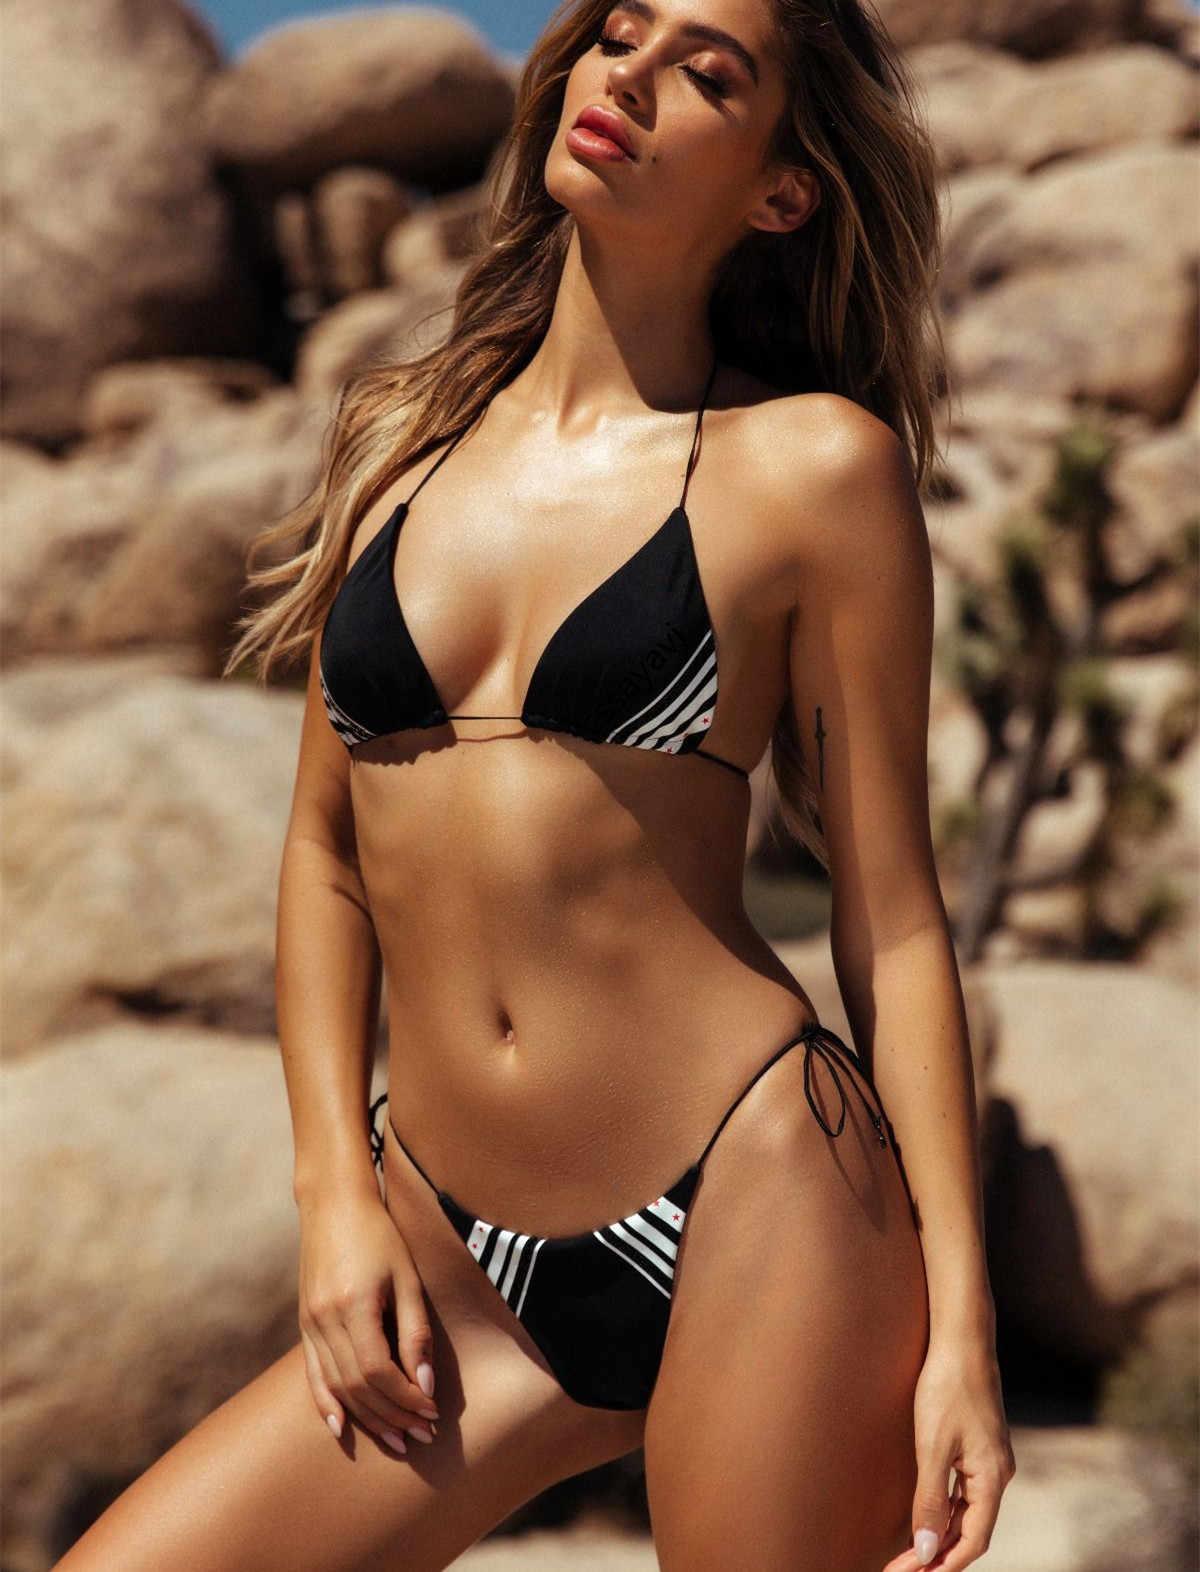 7724fe2f77a84a ... Bikinis 2019 Woman Thong Swimsuit Push Up High Leg Bandage Swimwear  Women Micro Bathing Suit Modis ...